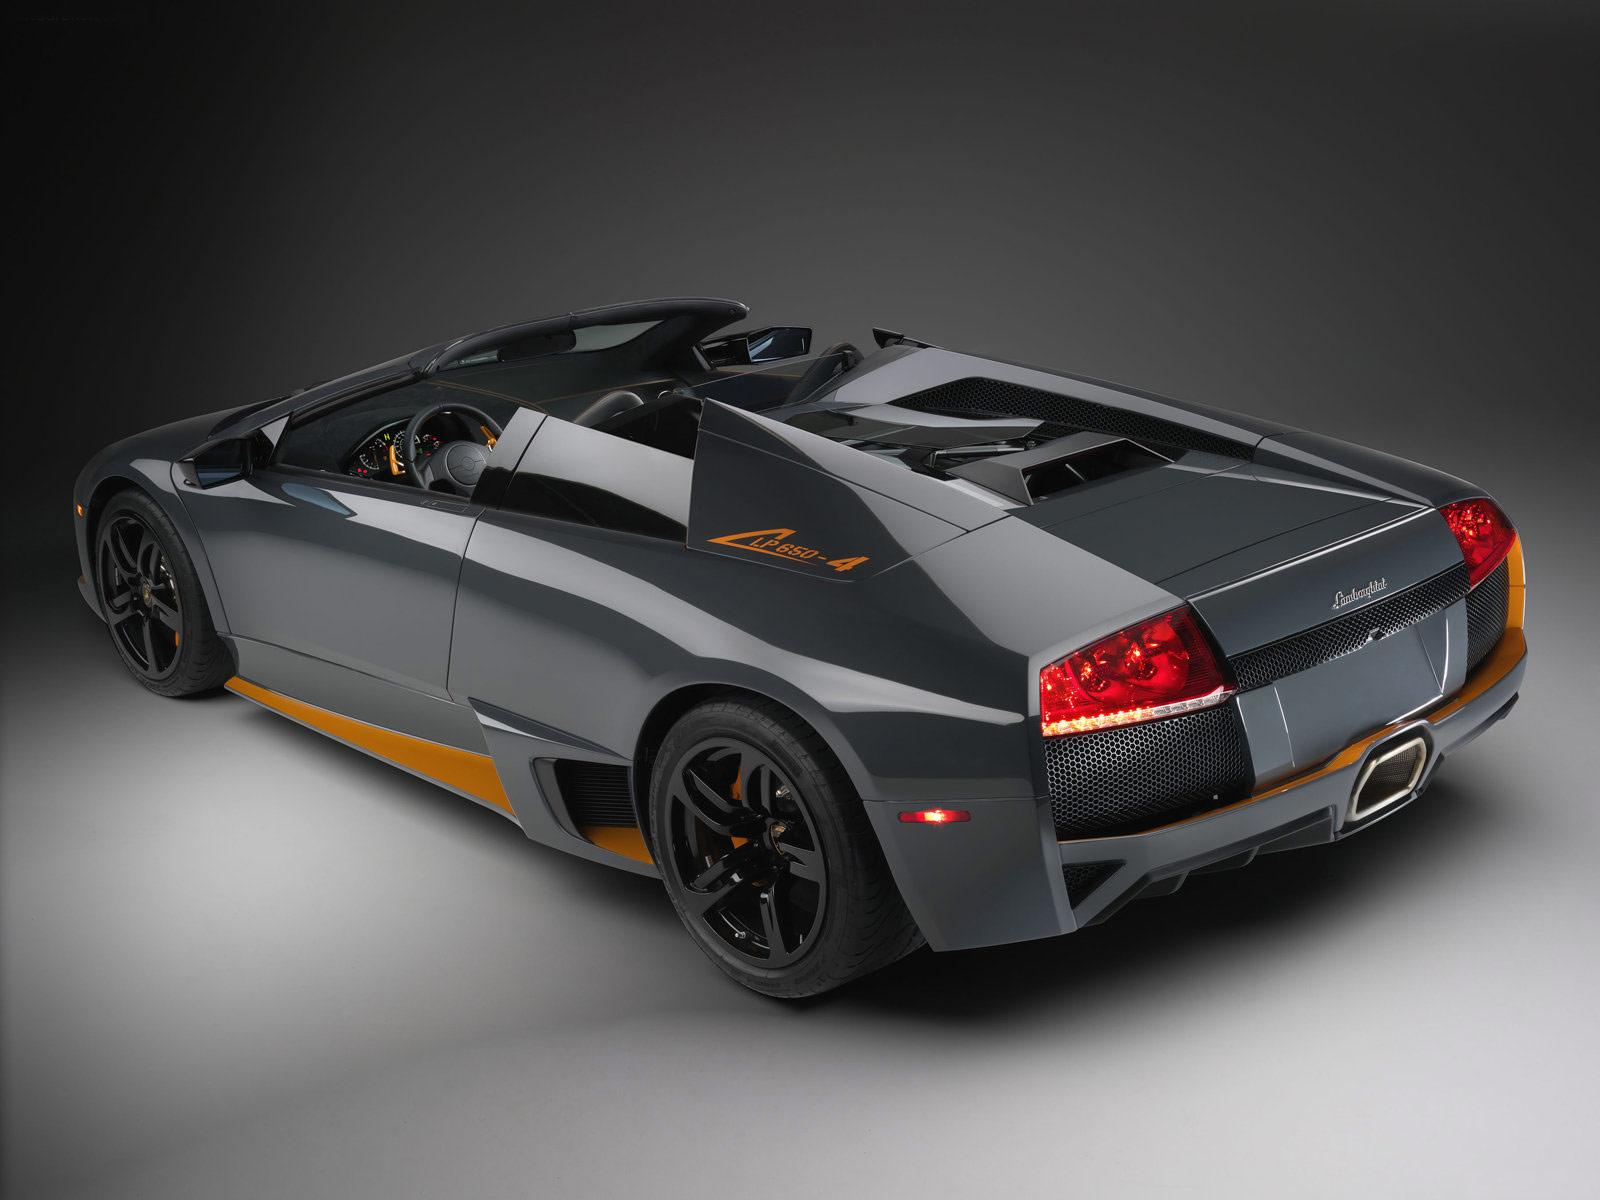 lamborghini murcielago lp650 4 roadster 2010. Black Bedroom Furniture Sets. Home Design Ideas